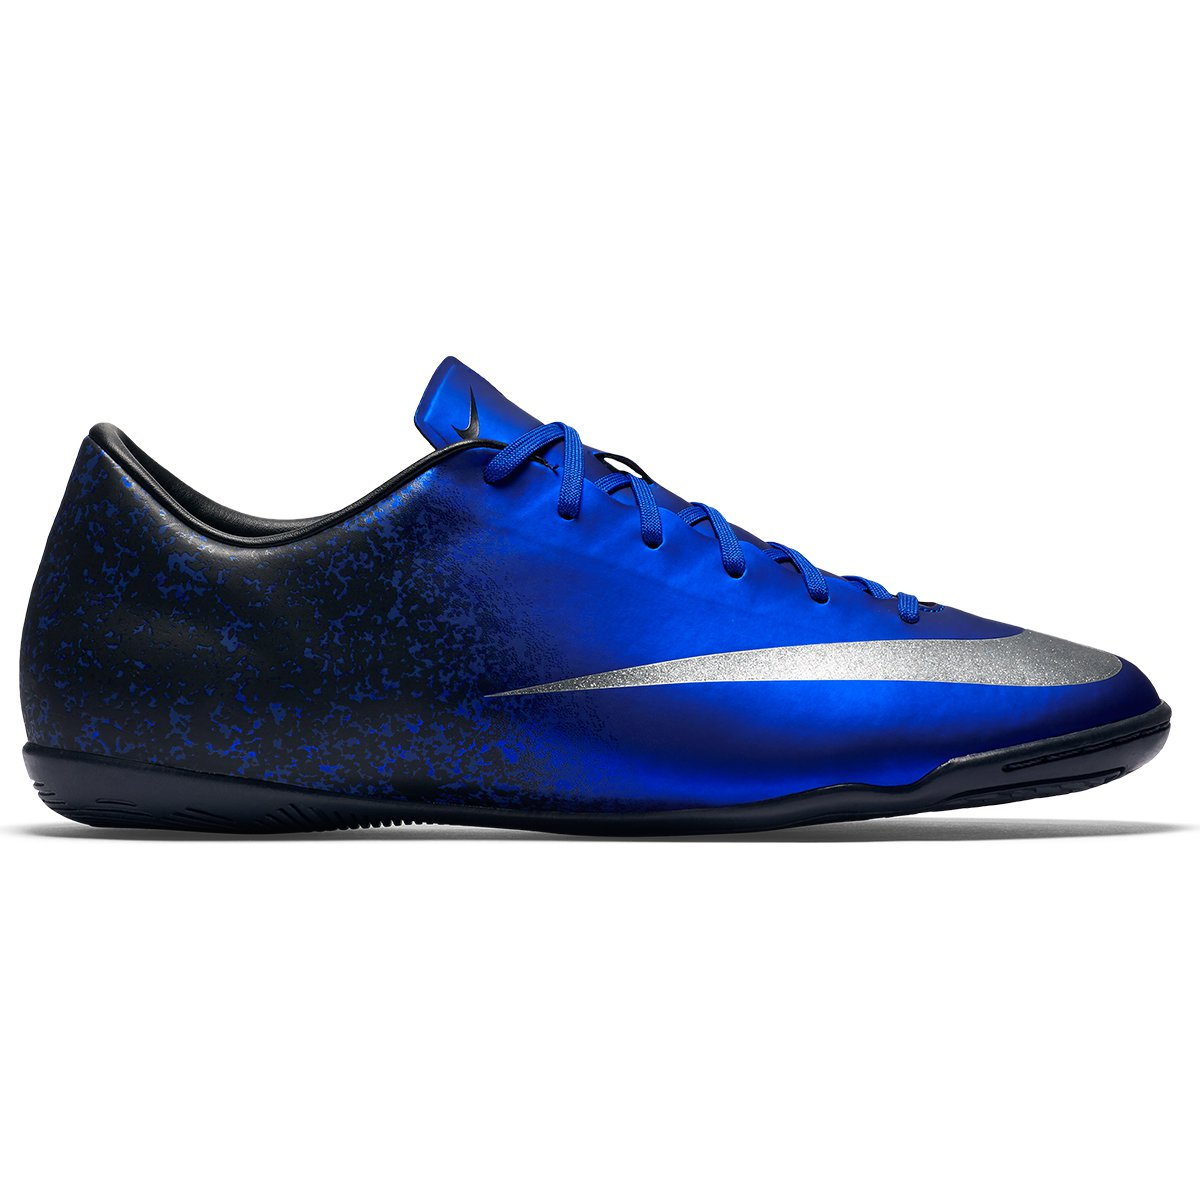 ae76b5cf3c72f ... Reviews) Chuteira Nike Mercurial Victory 5 CR7 IC Futsal - Azul e Prata  ...